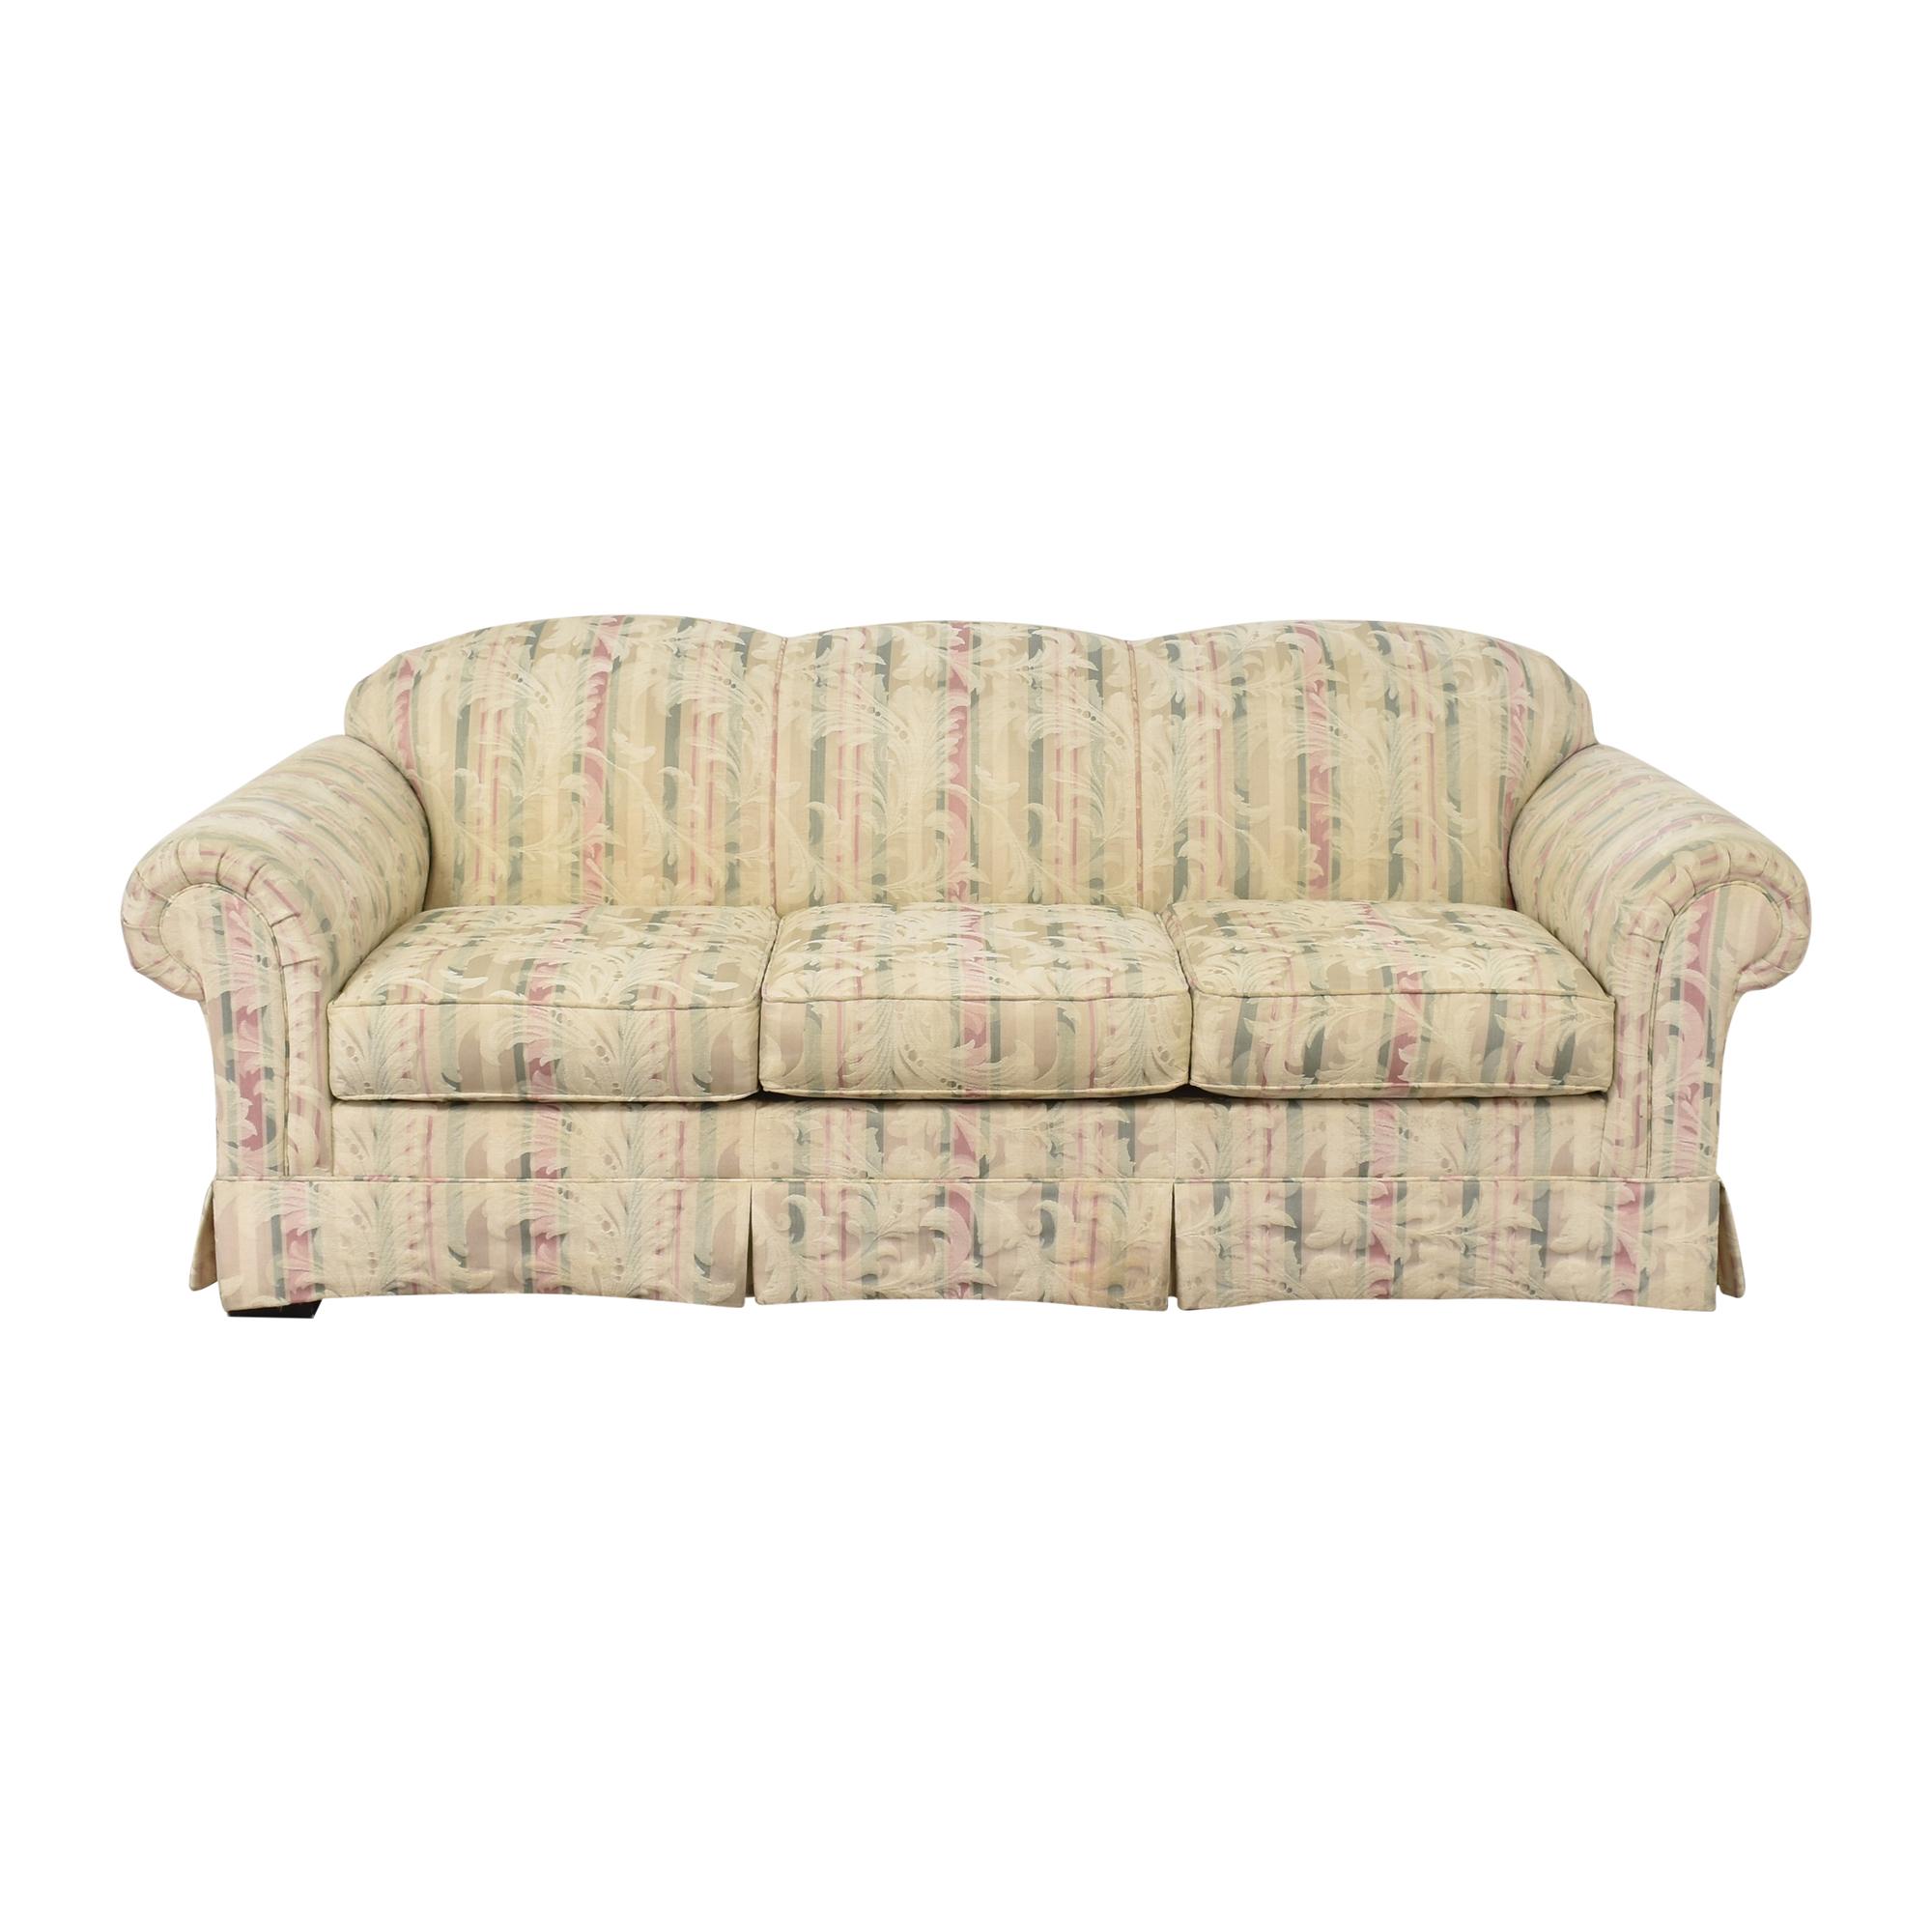 buy Macy's Macy's Skirted Sofa online